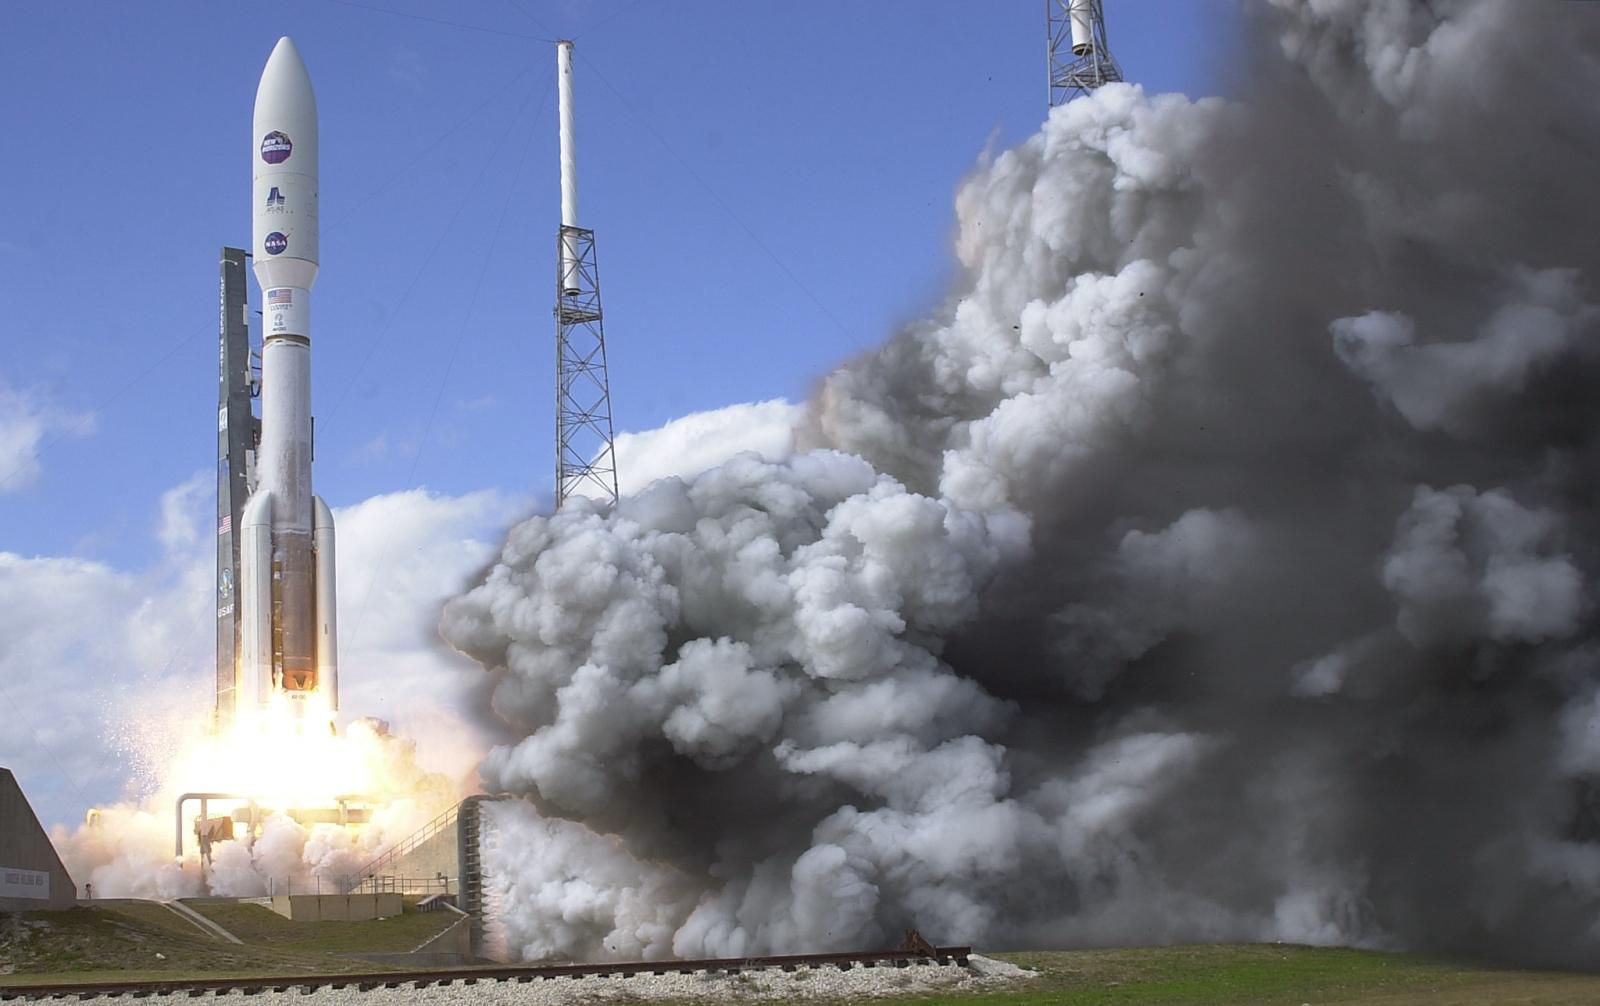 New Horizons spacecraft